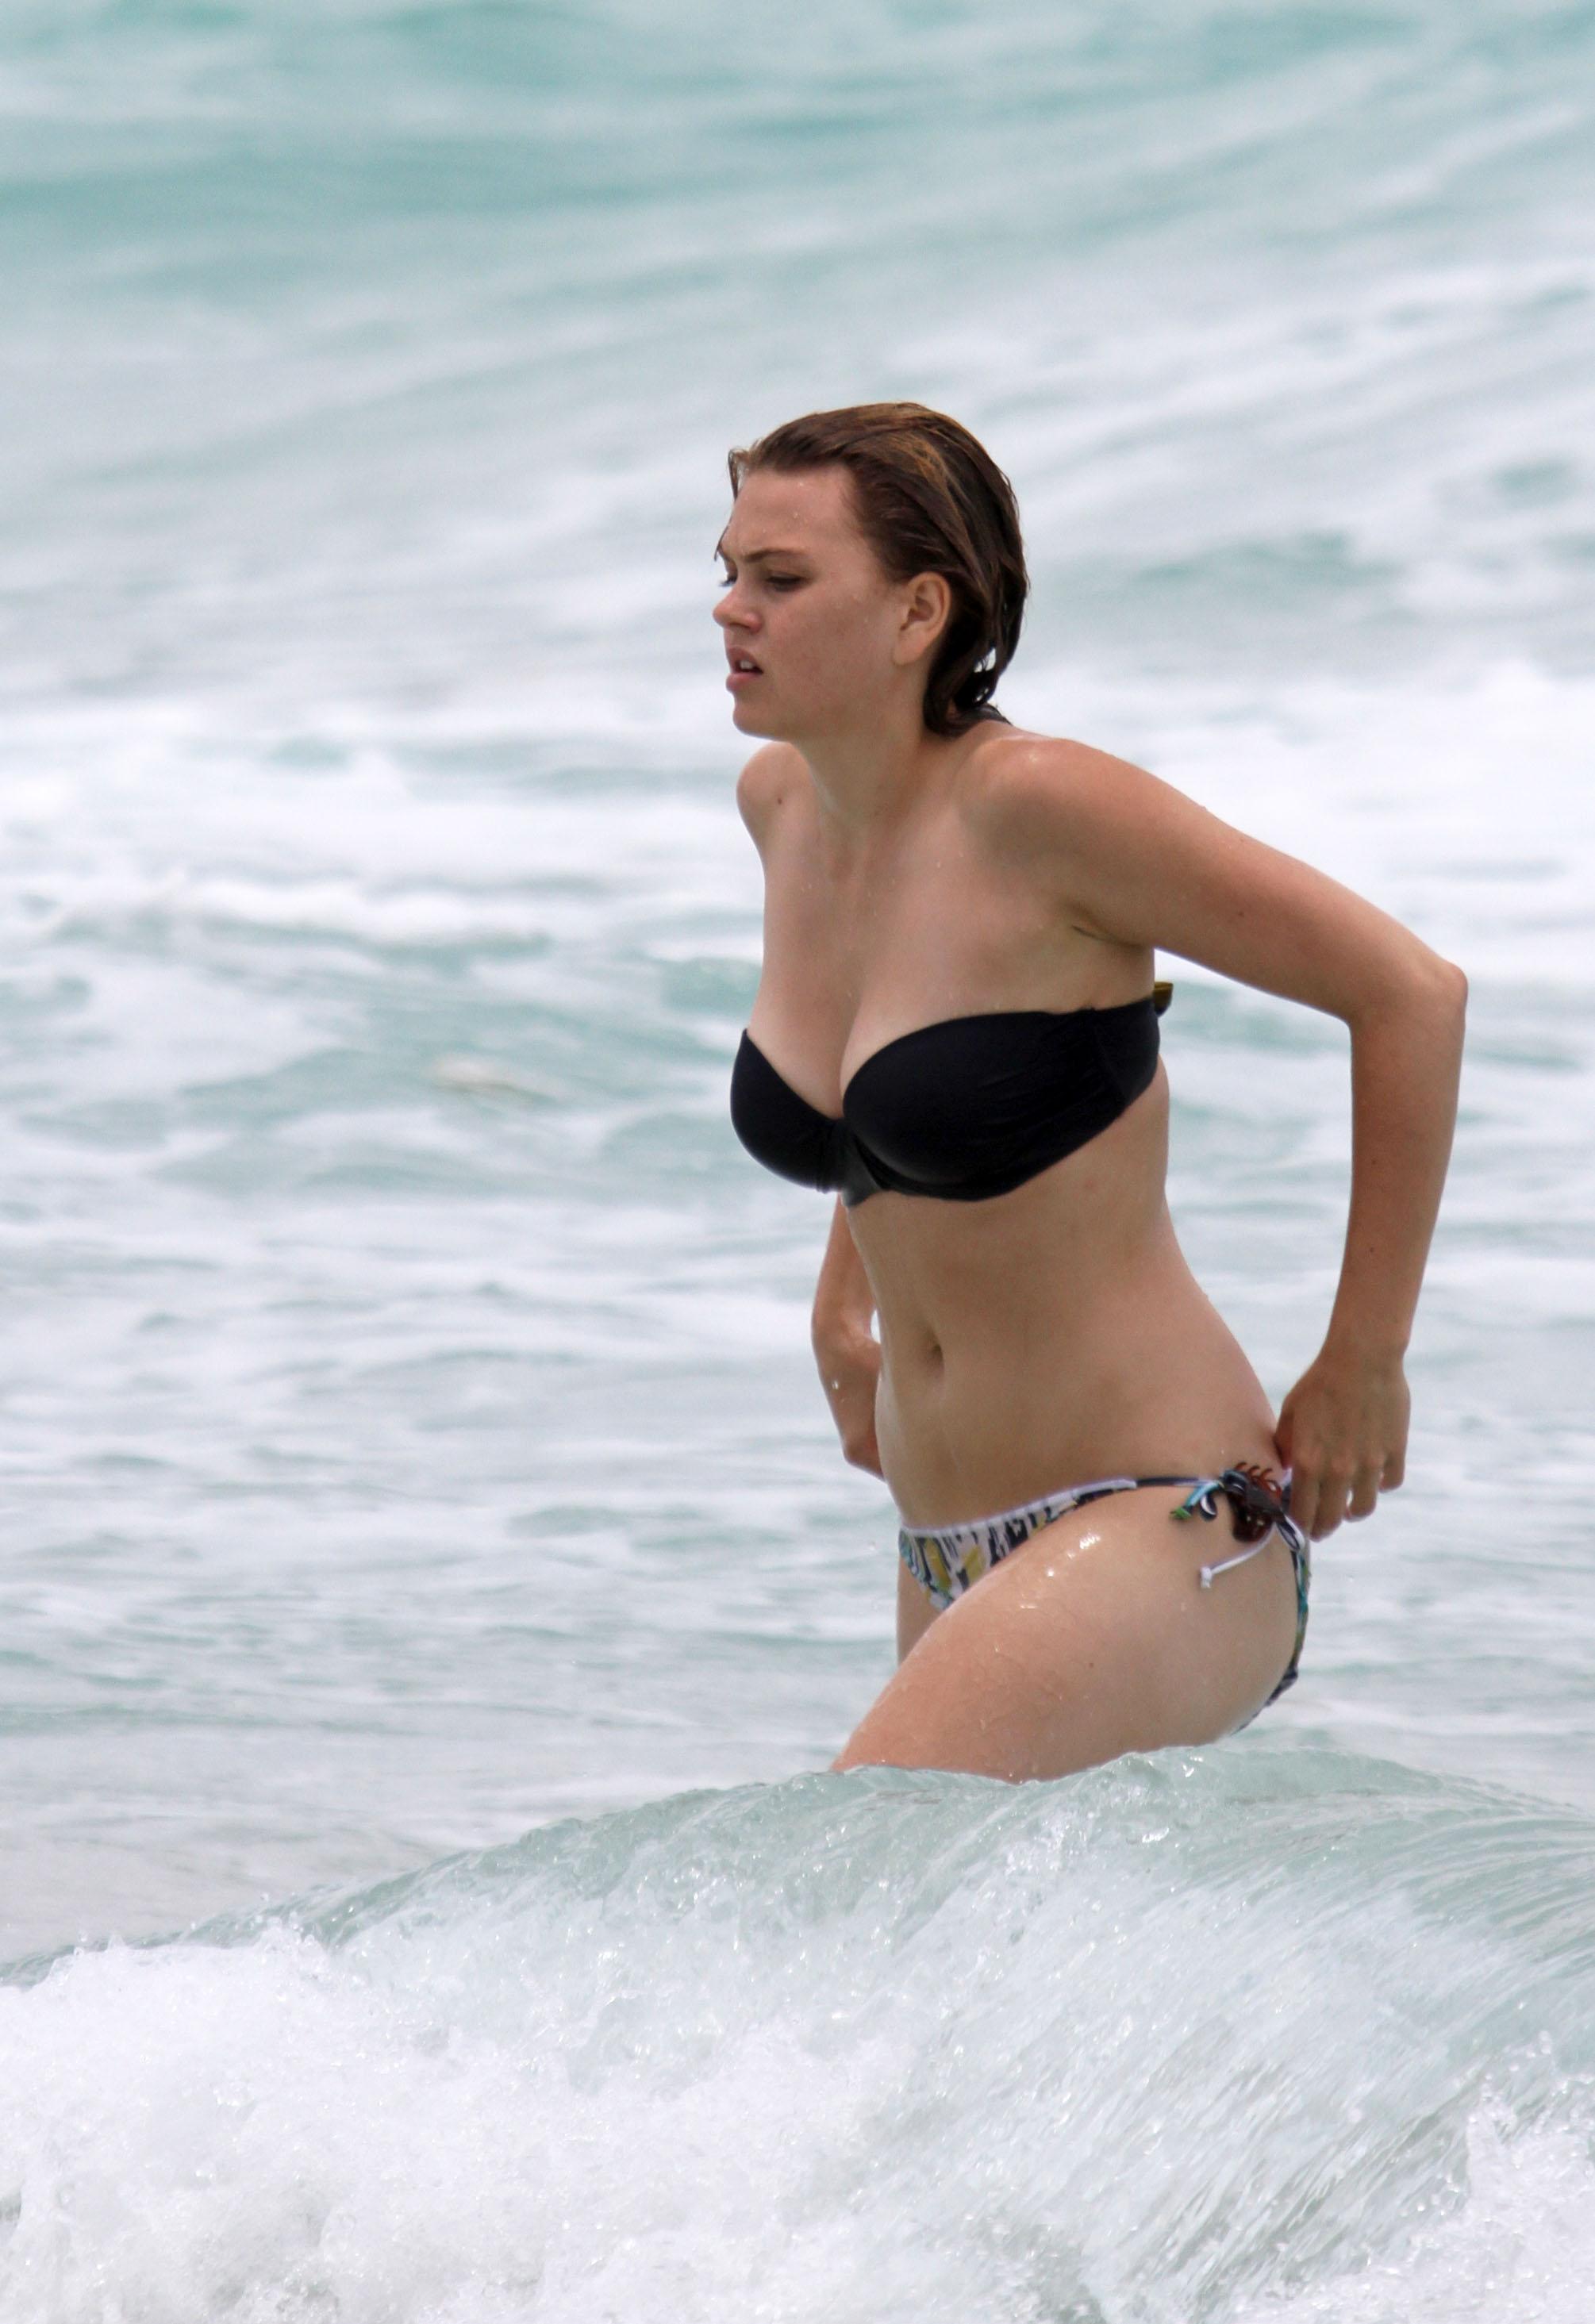 pantie-kim-aimee-teegarden-bikini-photos-position-the